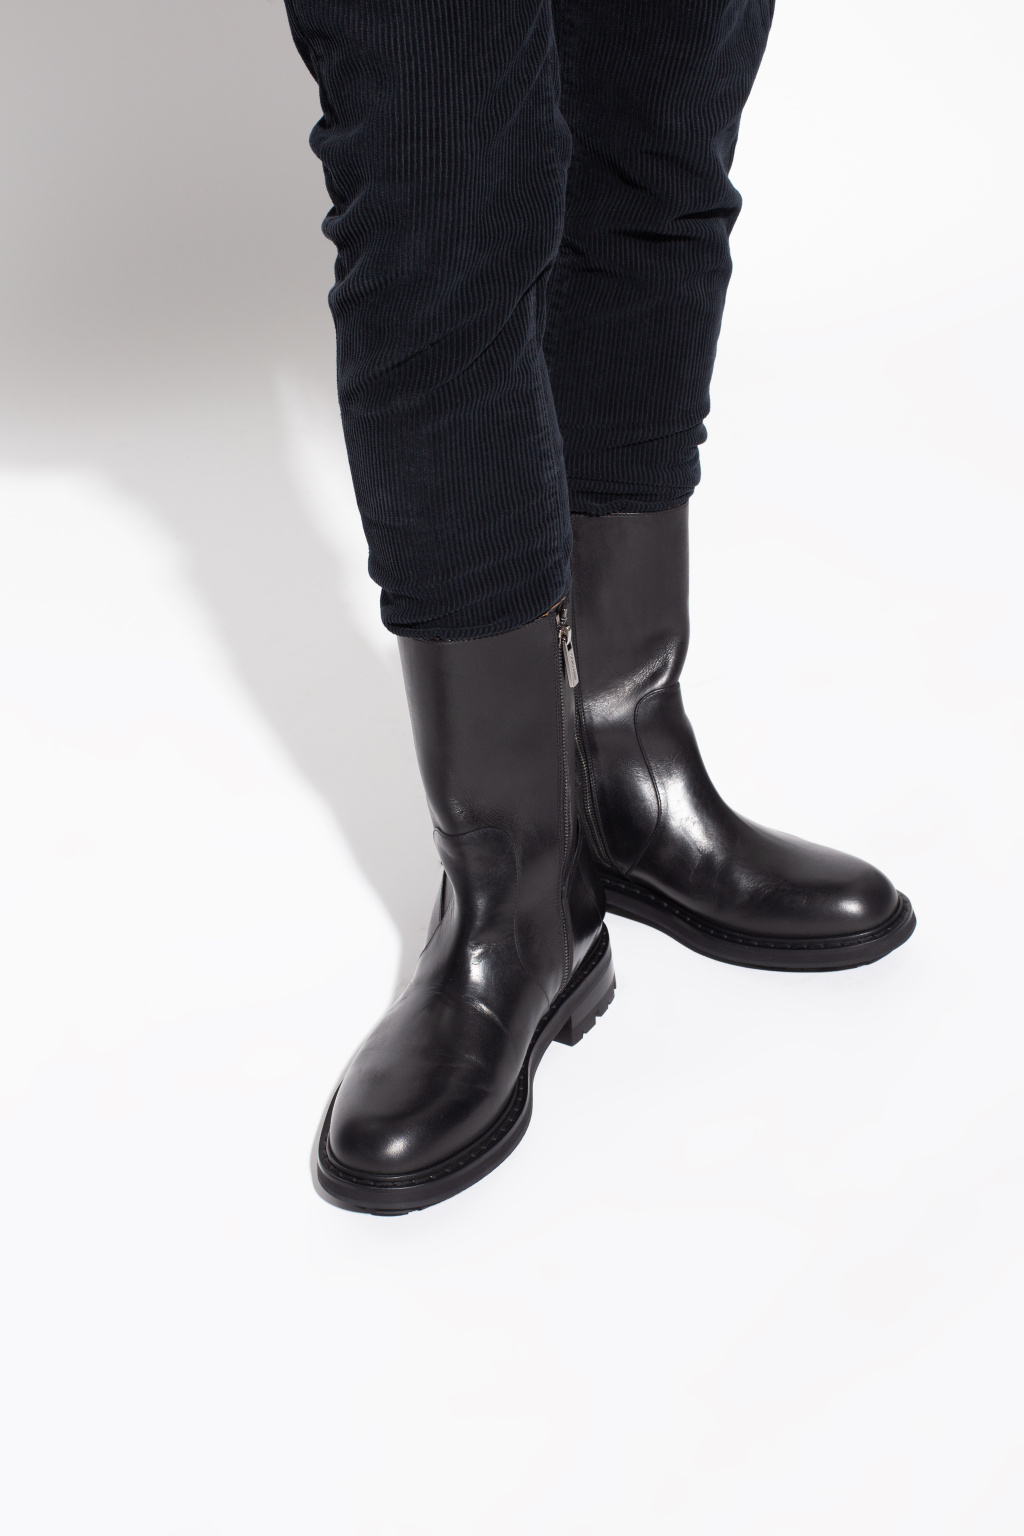 Jimmy Choo 'Roscoe' shoes